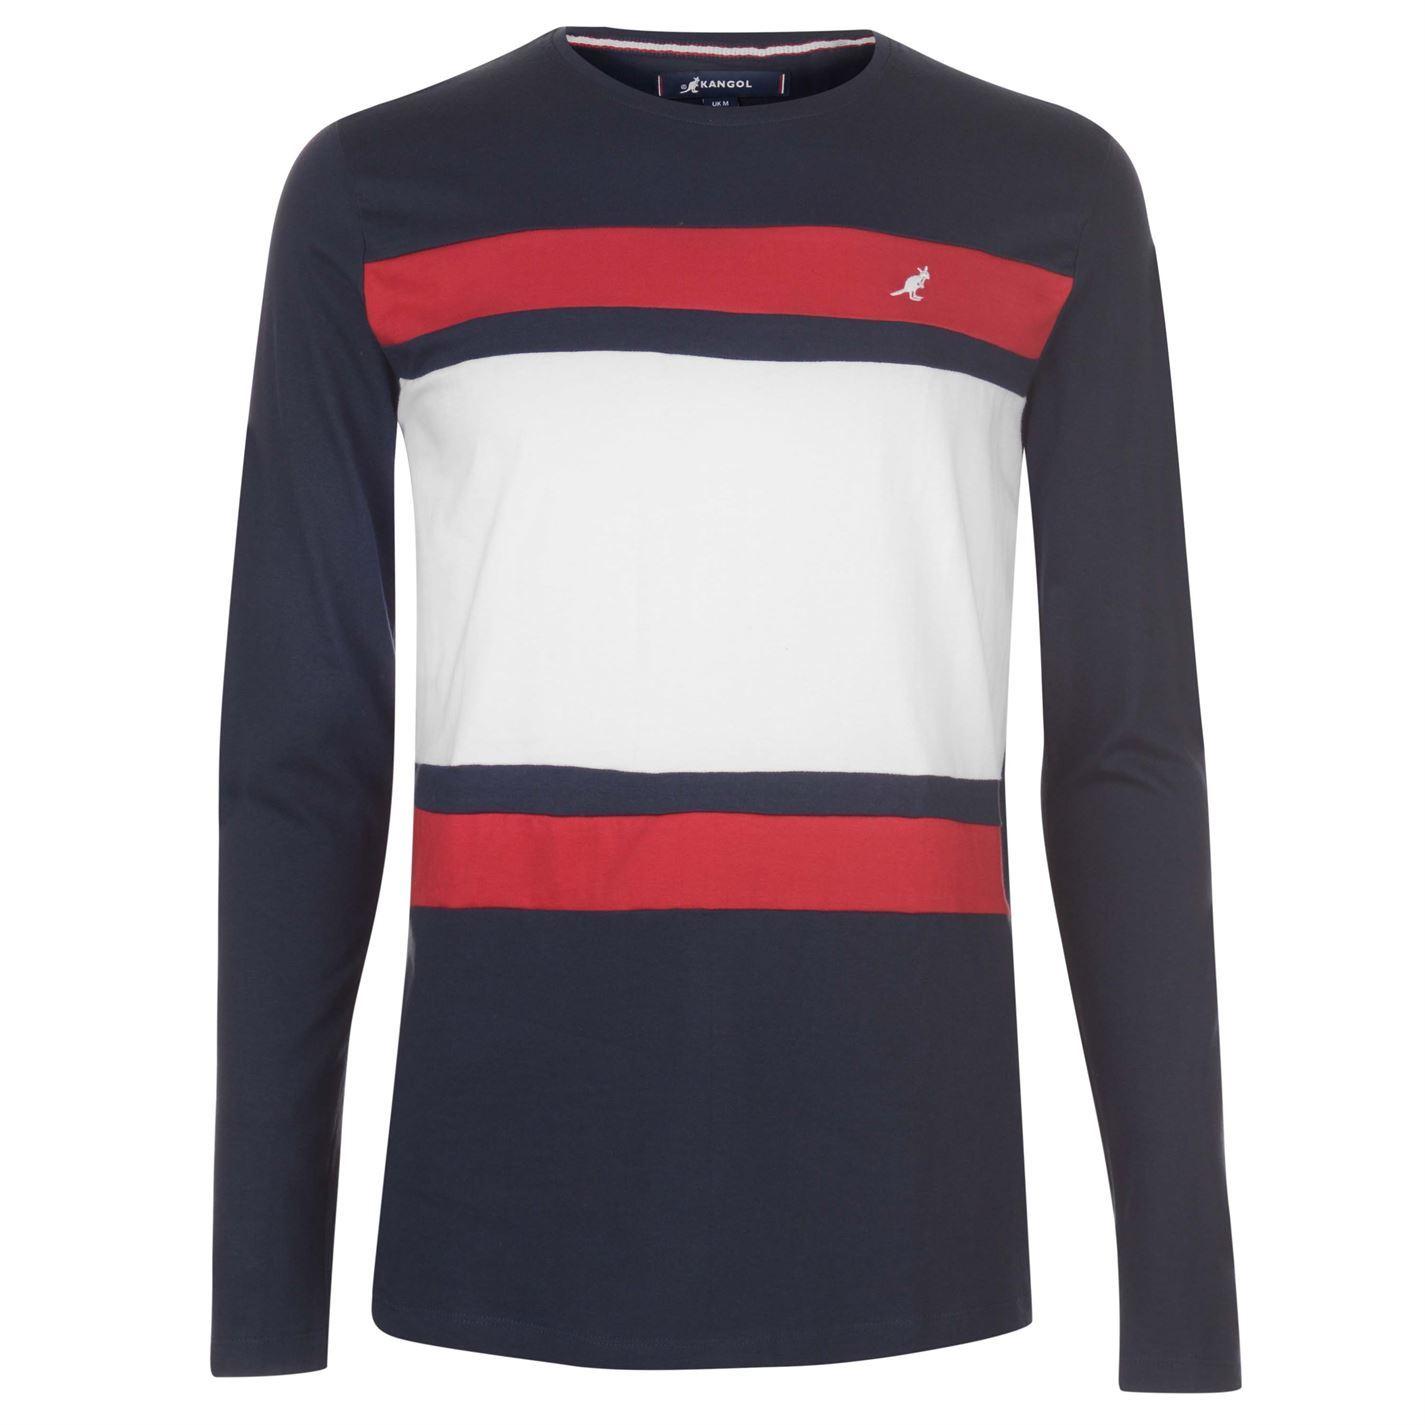 Kangol-Long-Sleeve-T-Shirt-Mens-Tee-Shirt-Top thumbnail 12